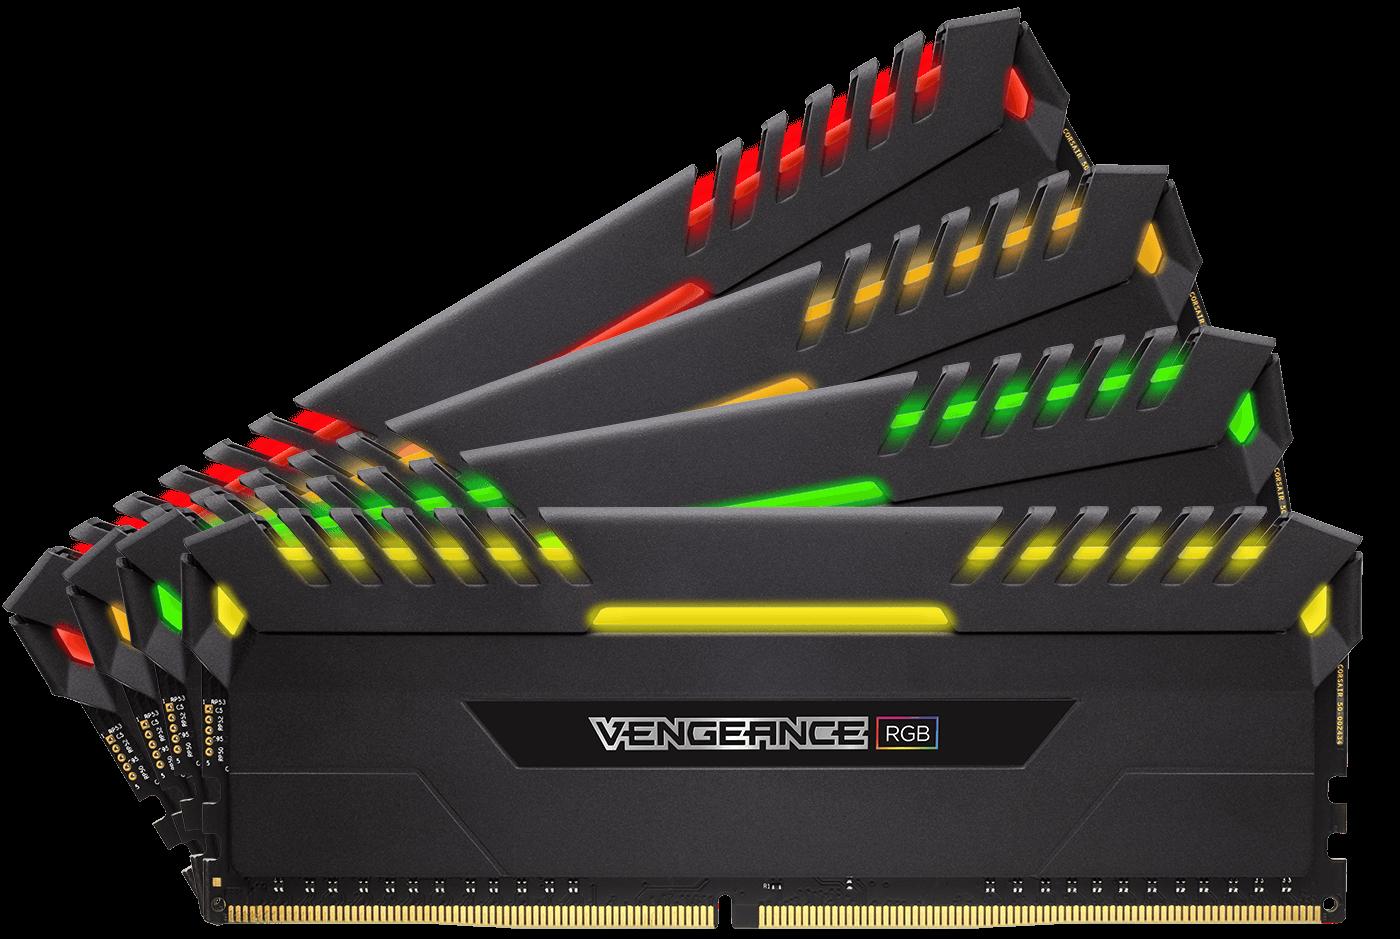 Memorie Desktop Corsair Vengeance RGB 64GB(4 x 16GB) DDR4 3466MHz